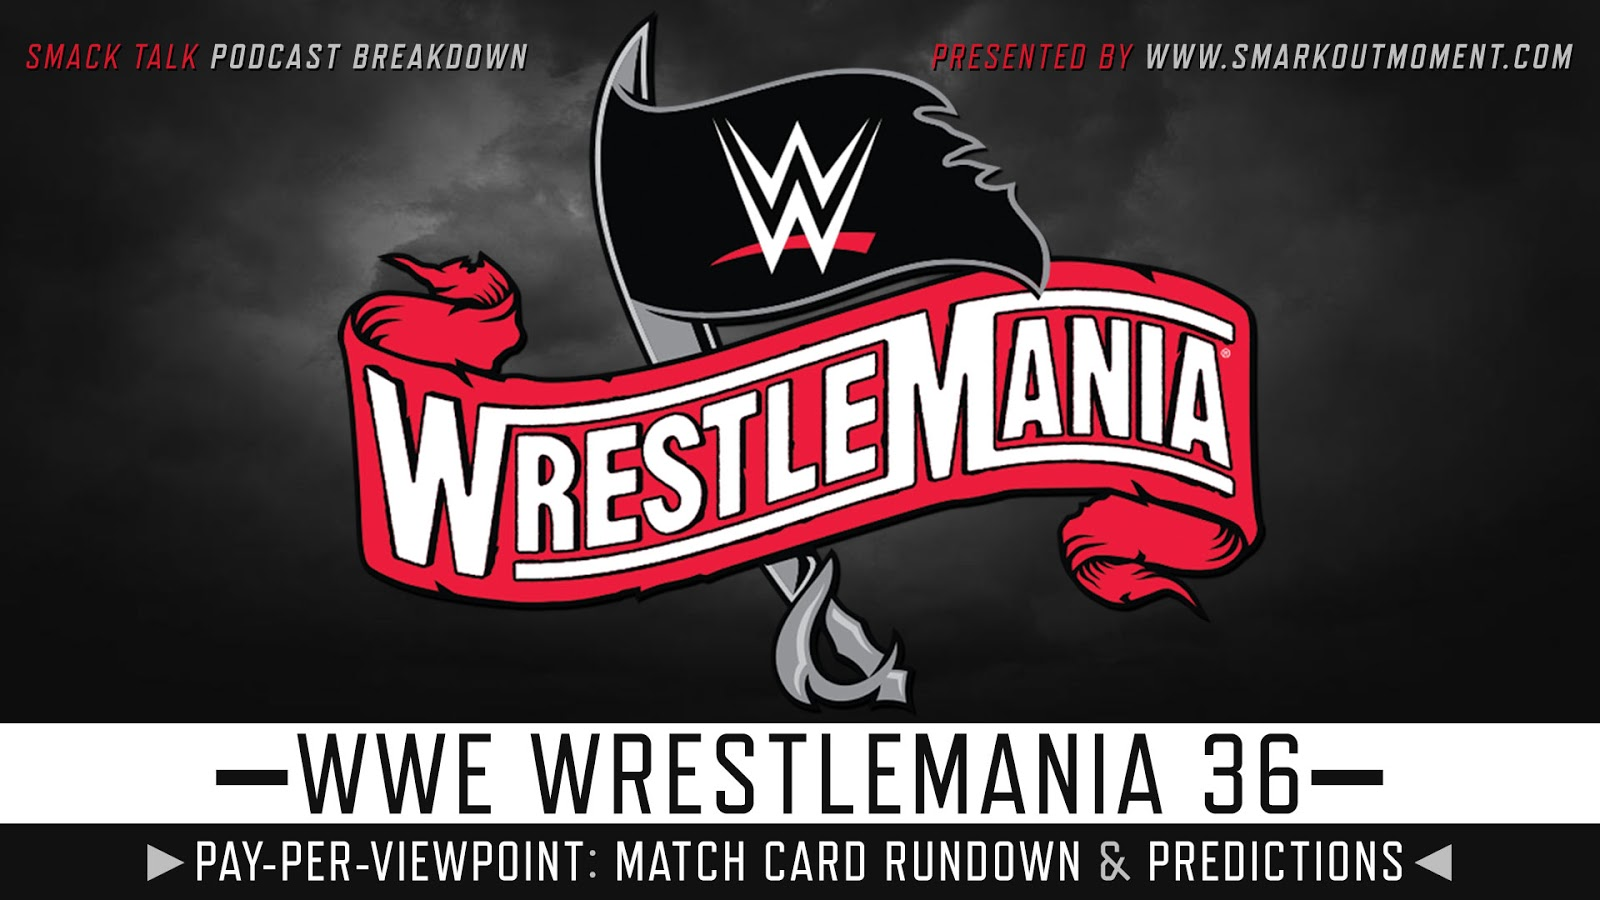 WWE WrestleMania 36 spoilers podcast